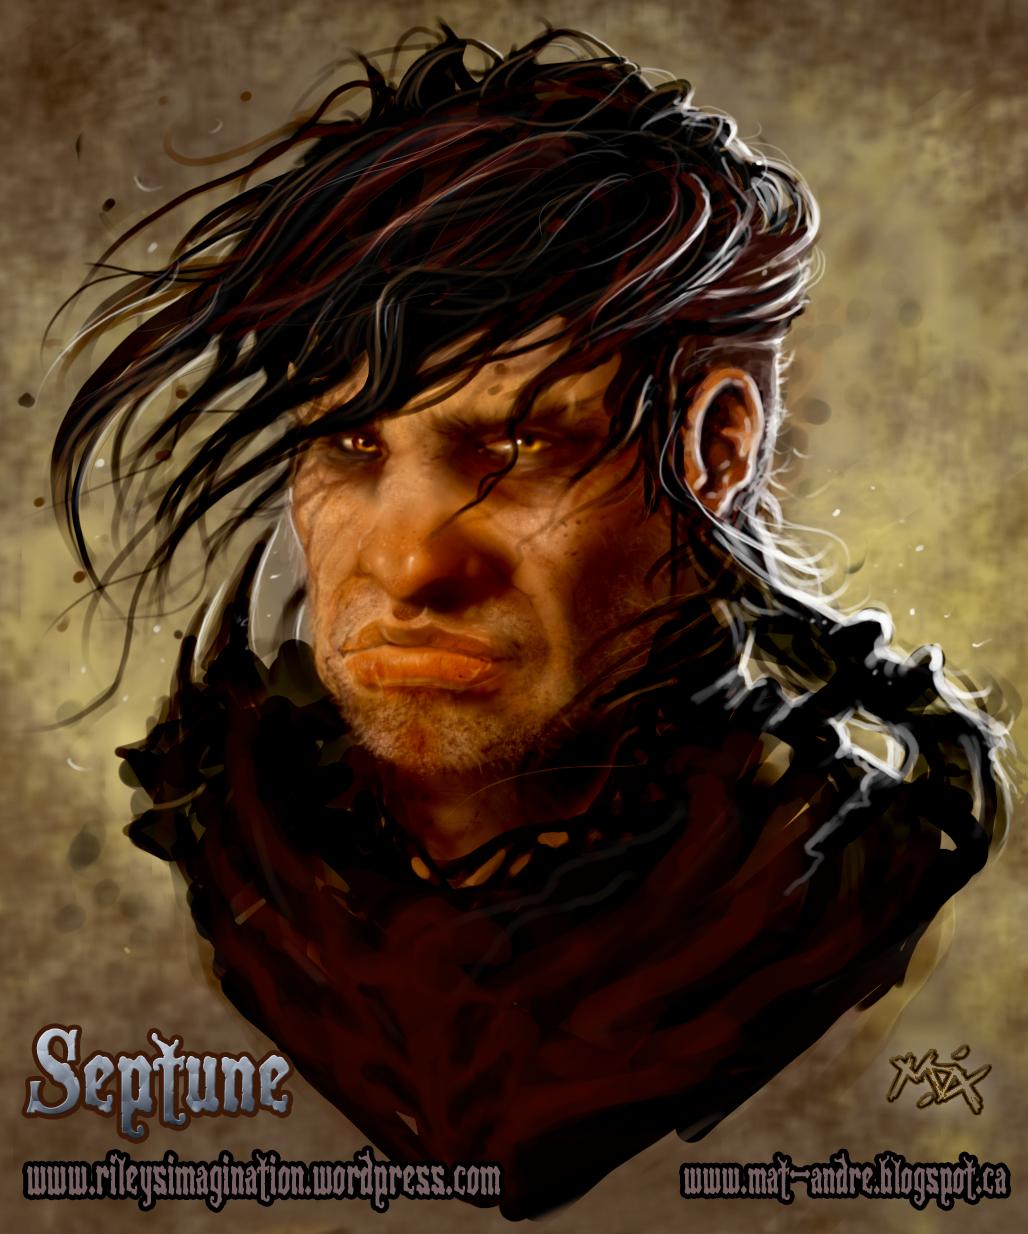 Septune Concept